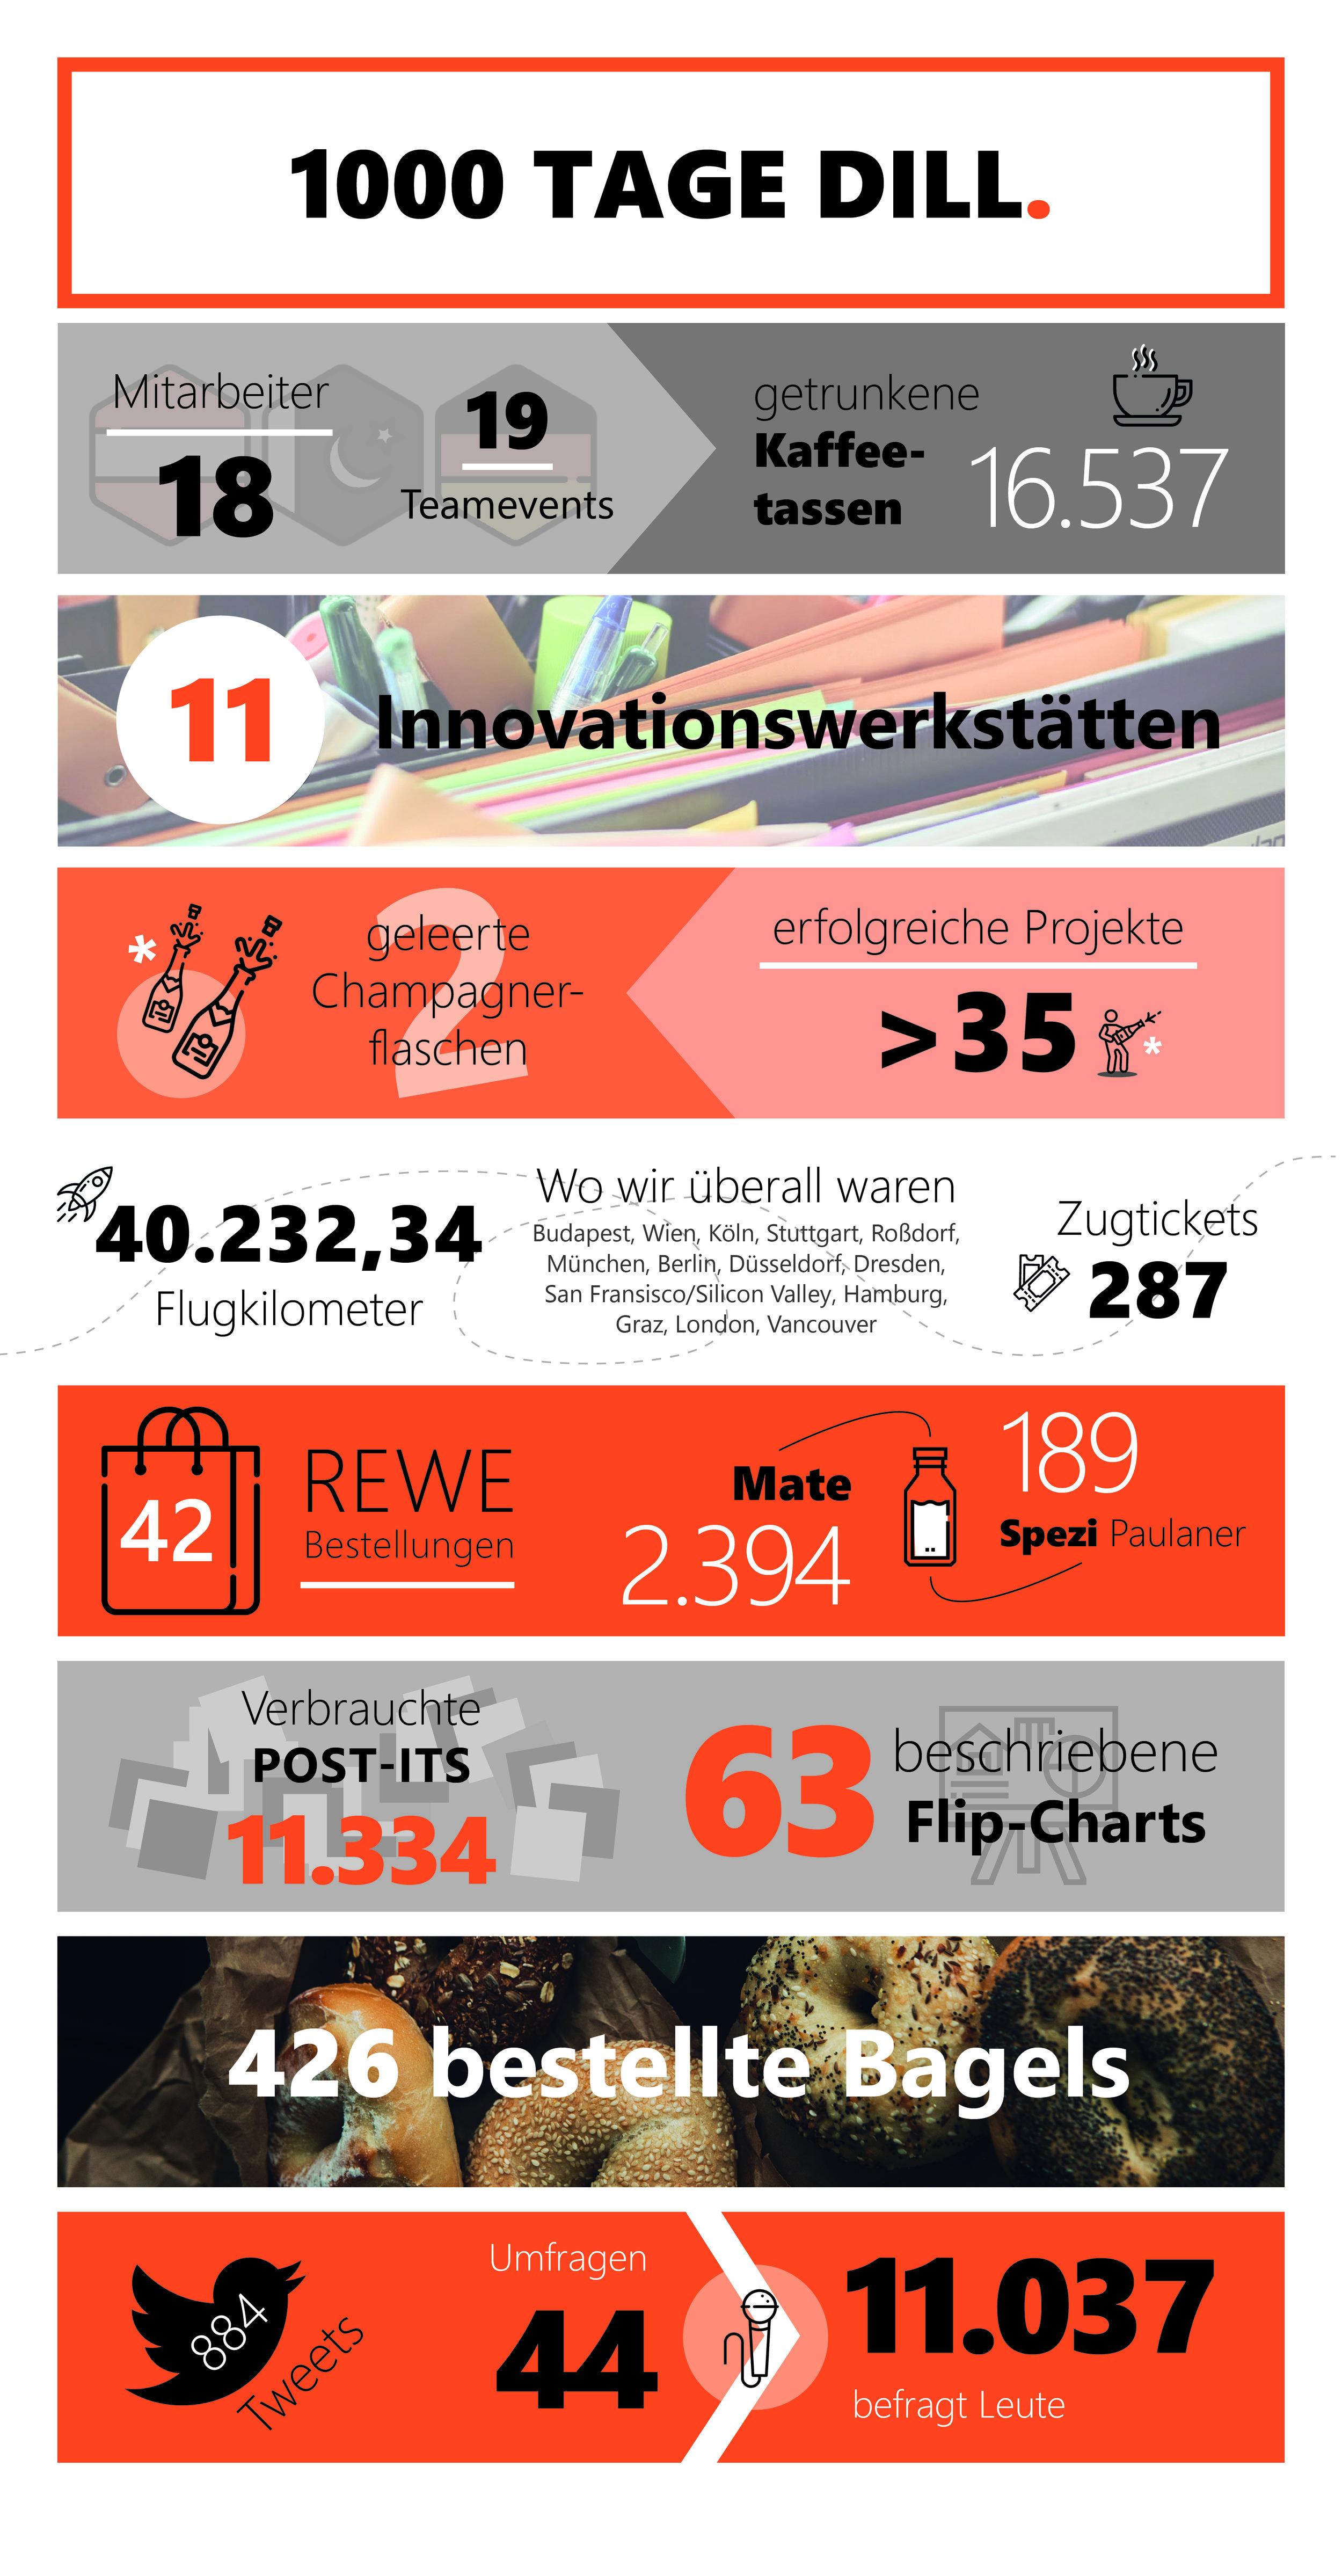 DILL-Infografik.jpg